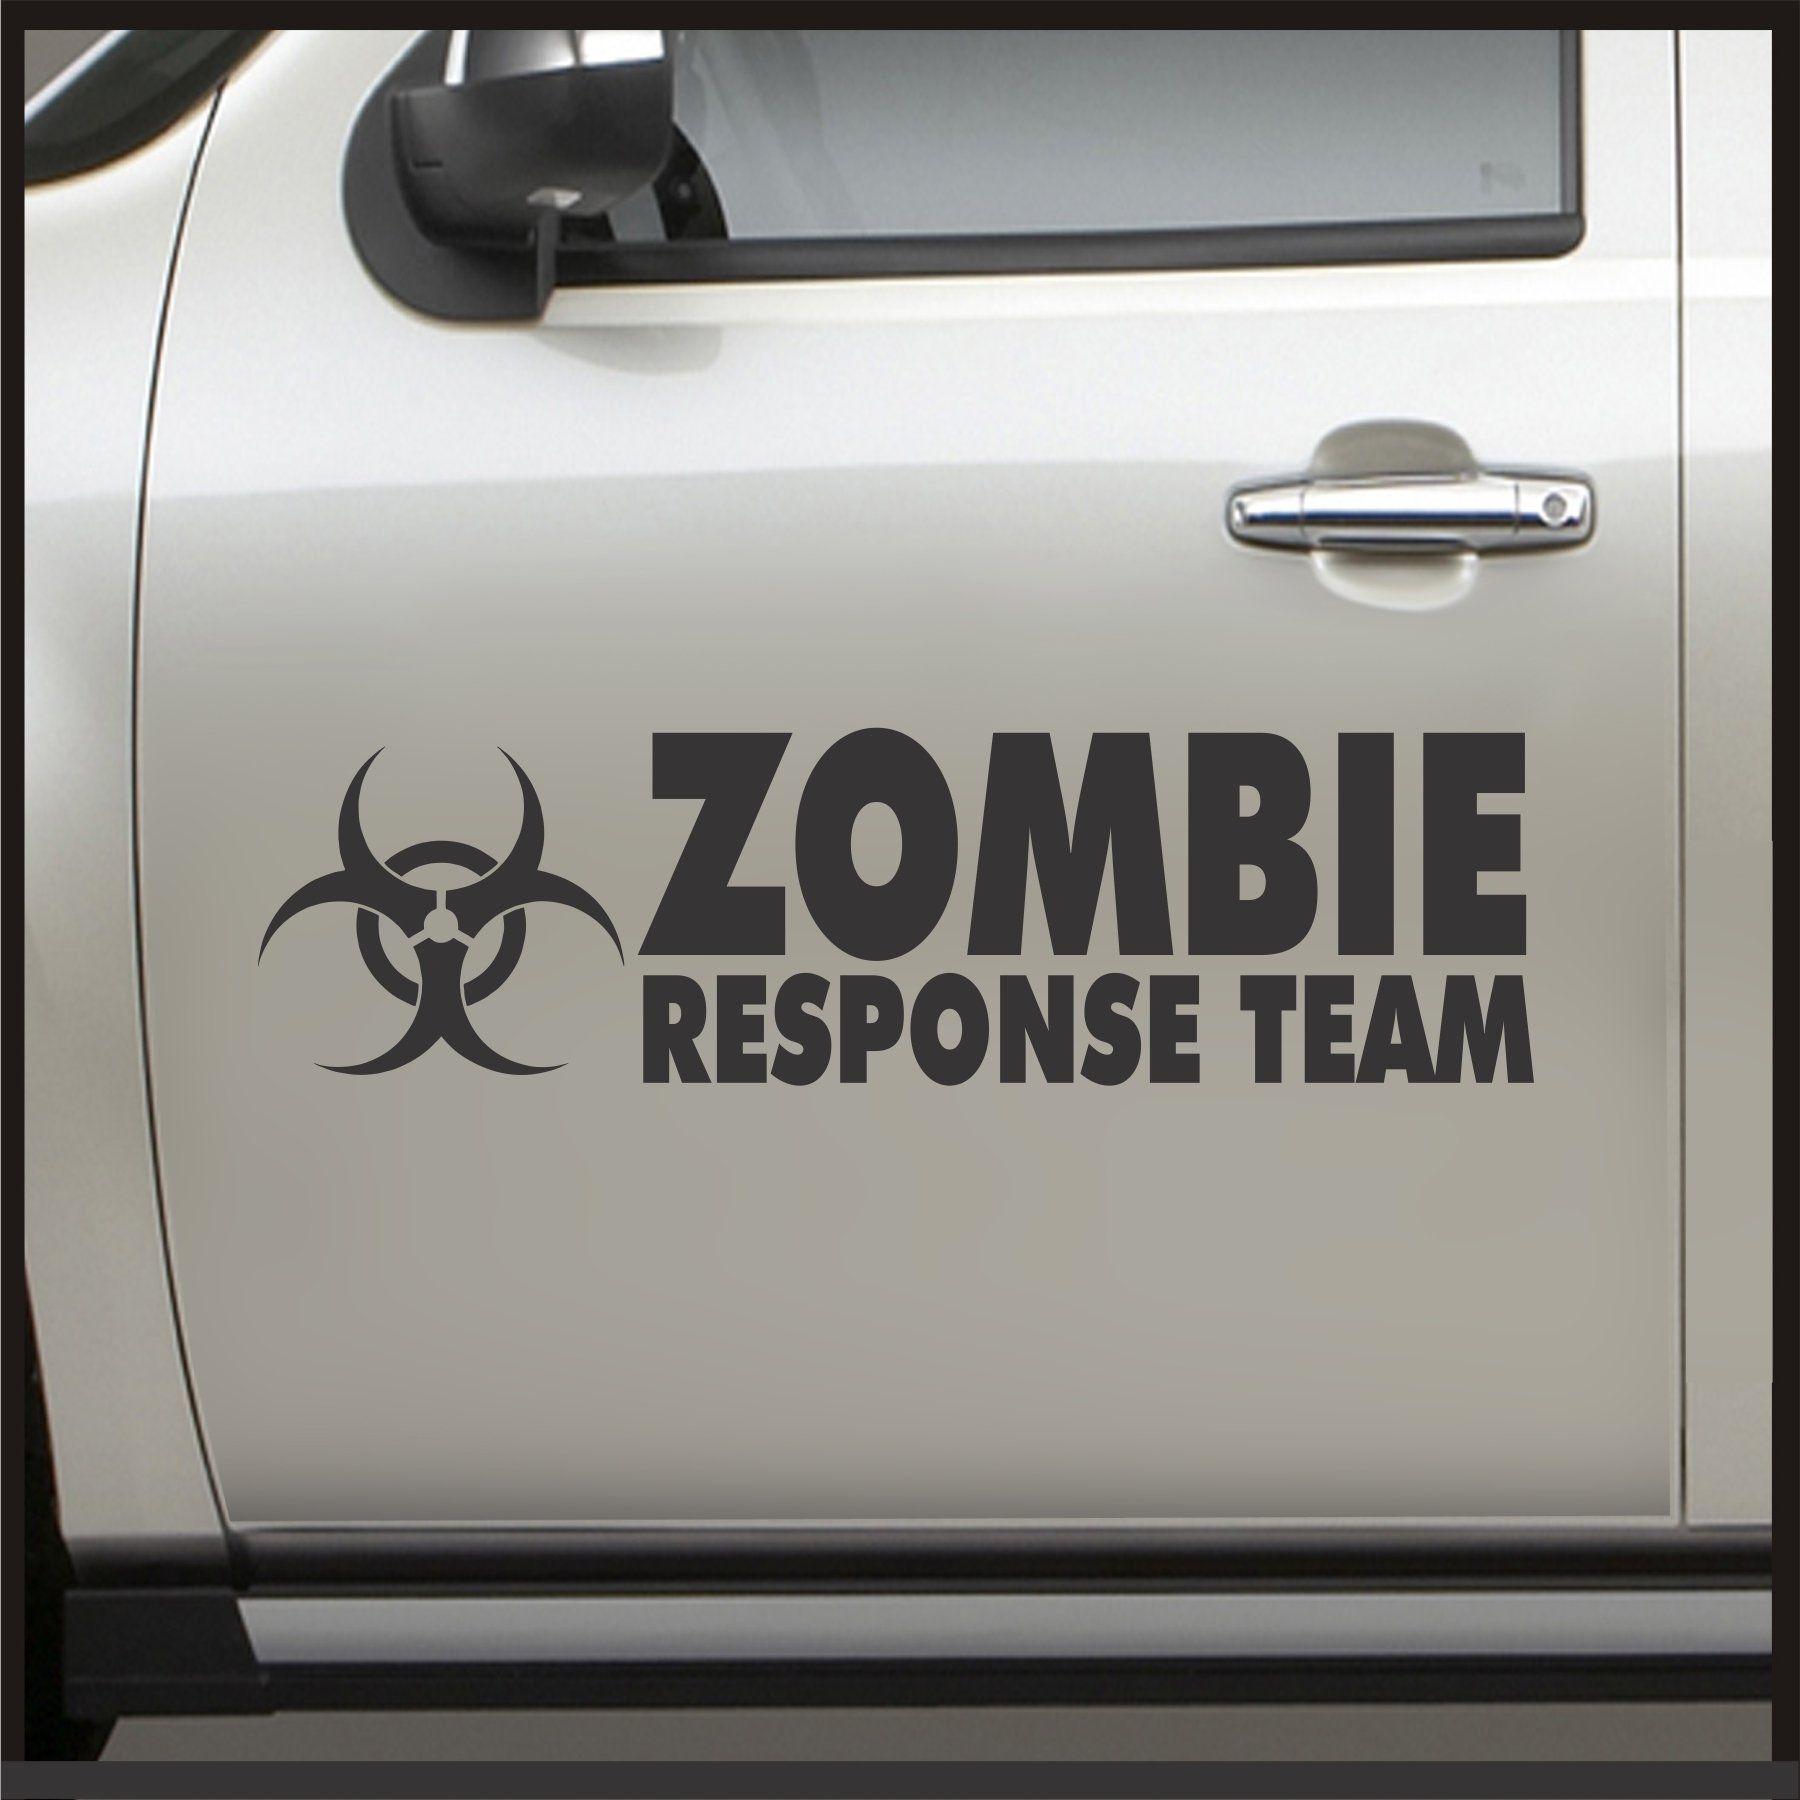 Amazon Com Set 2 Zombie Response Team Door Sticker Sticker For Jeep Decal Jdm Vinyl Car Apocalypse Automot Zombie Response Team Zombie Response Jeep Decals [ jpg ]